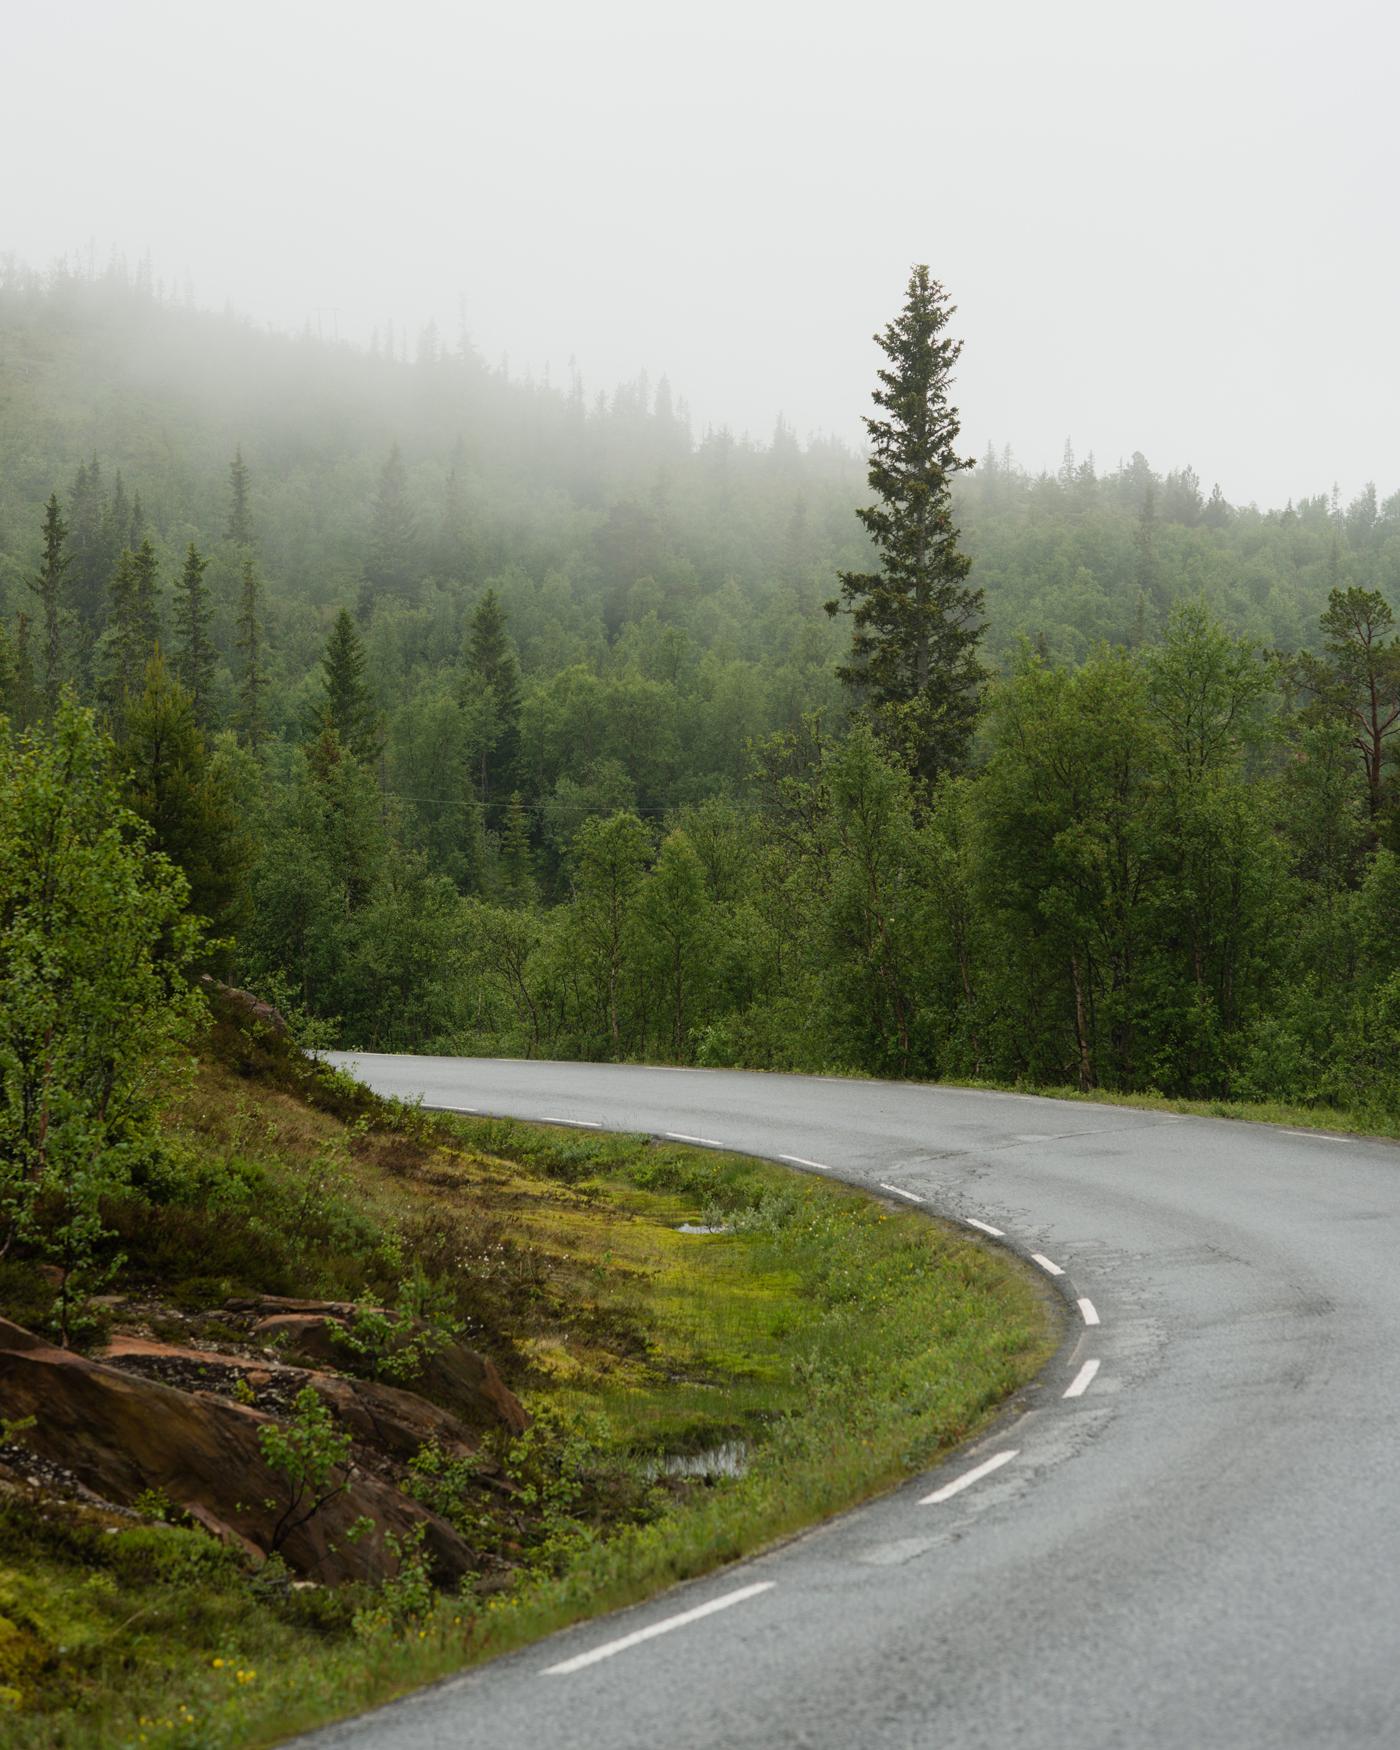 Hessdalen, light summer rain. June 2013.